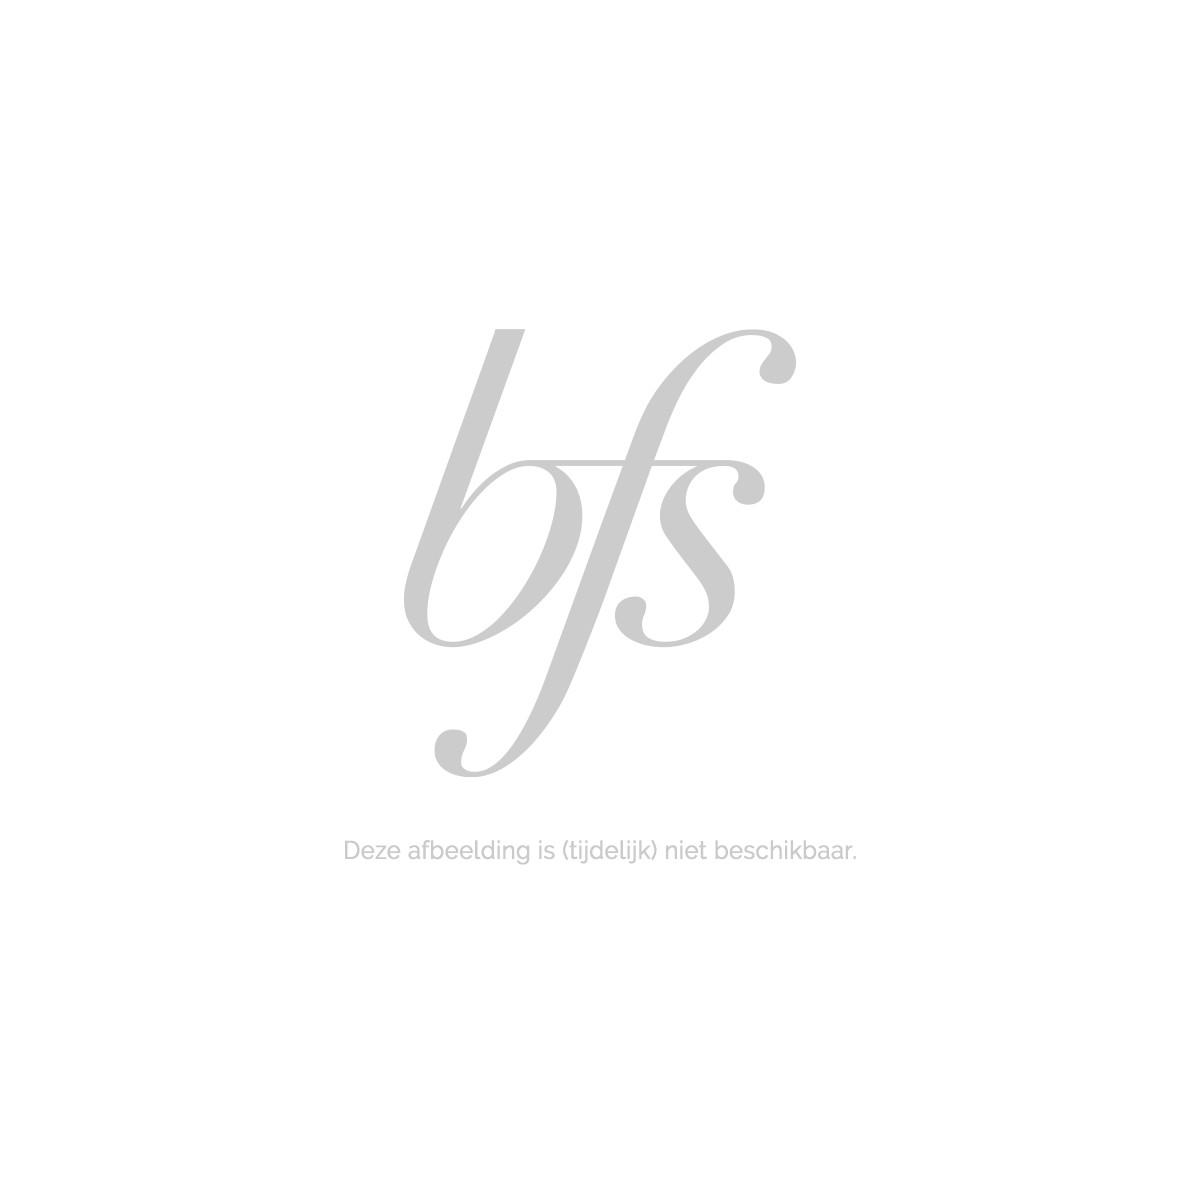 Benecos Natural Shampoo Family Size Freshness Adventure 950 Ml